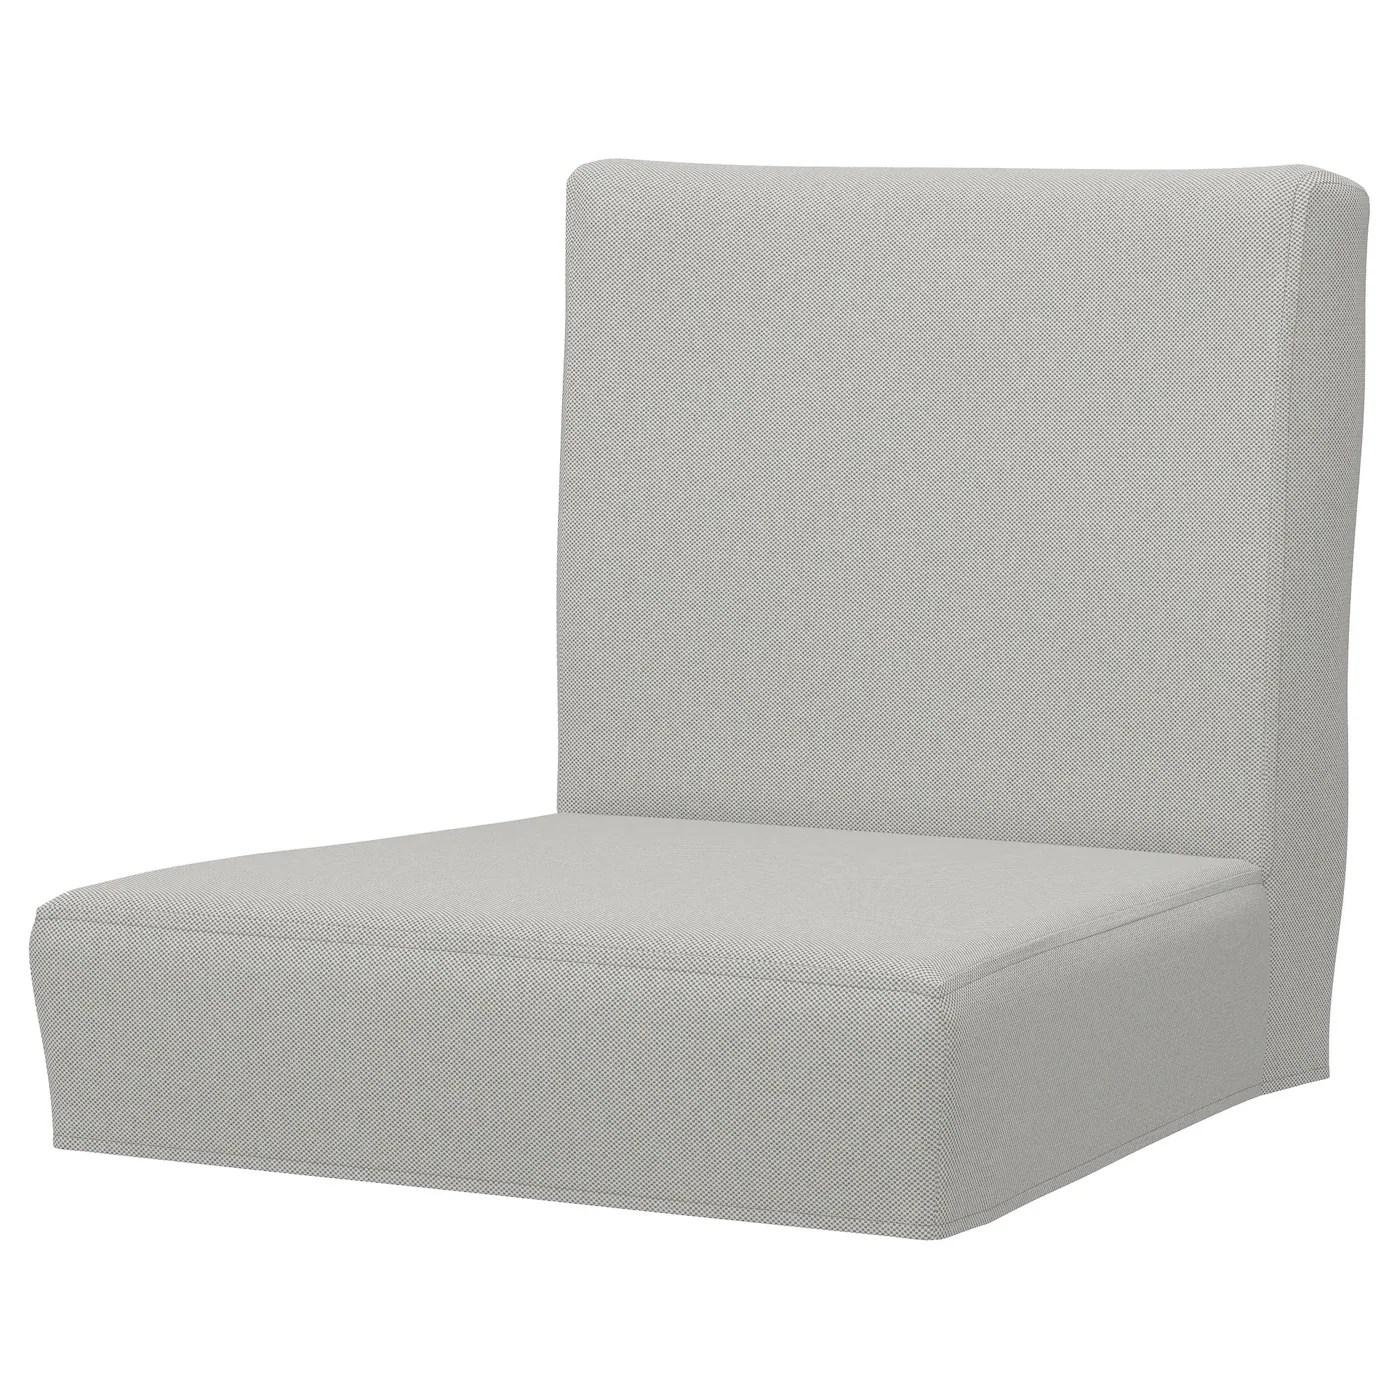 ikea belfast chair covers swivel keeps dropping dining dublin ireland